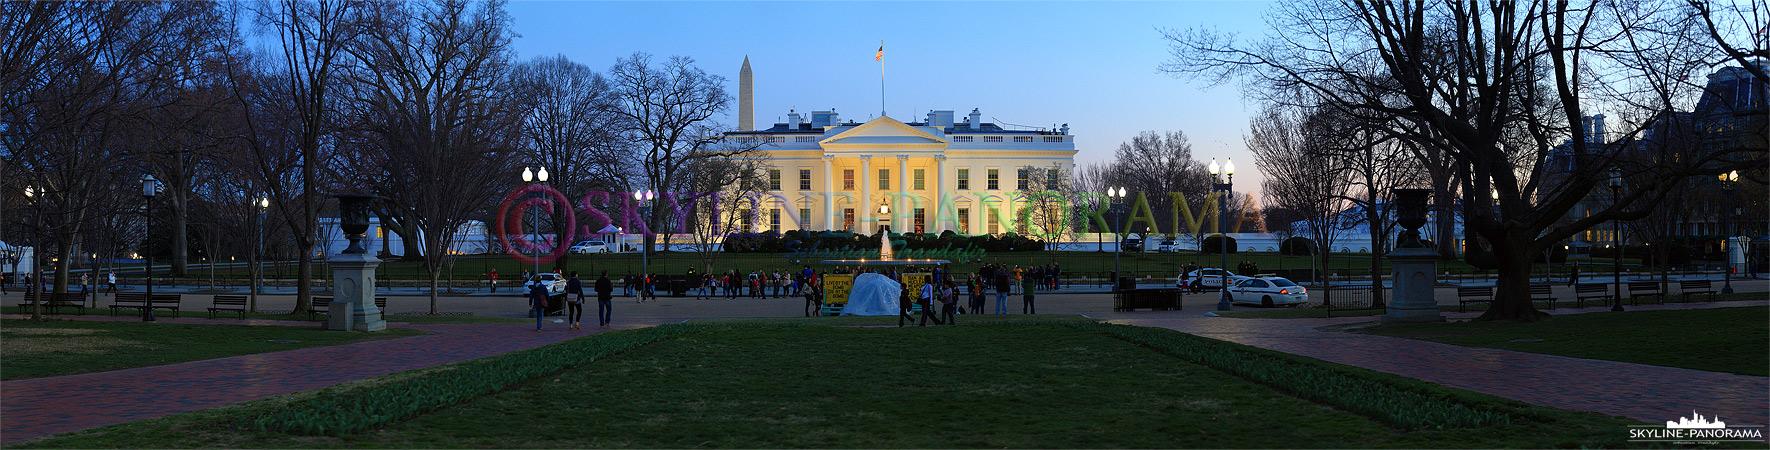 Washington D.C. - White House Panorama